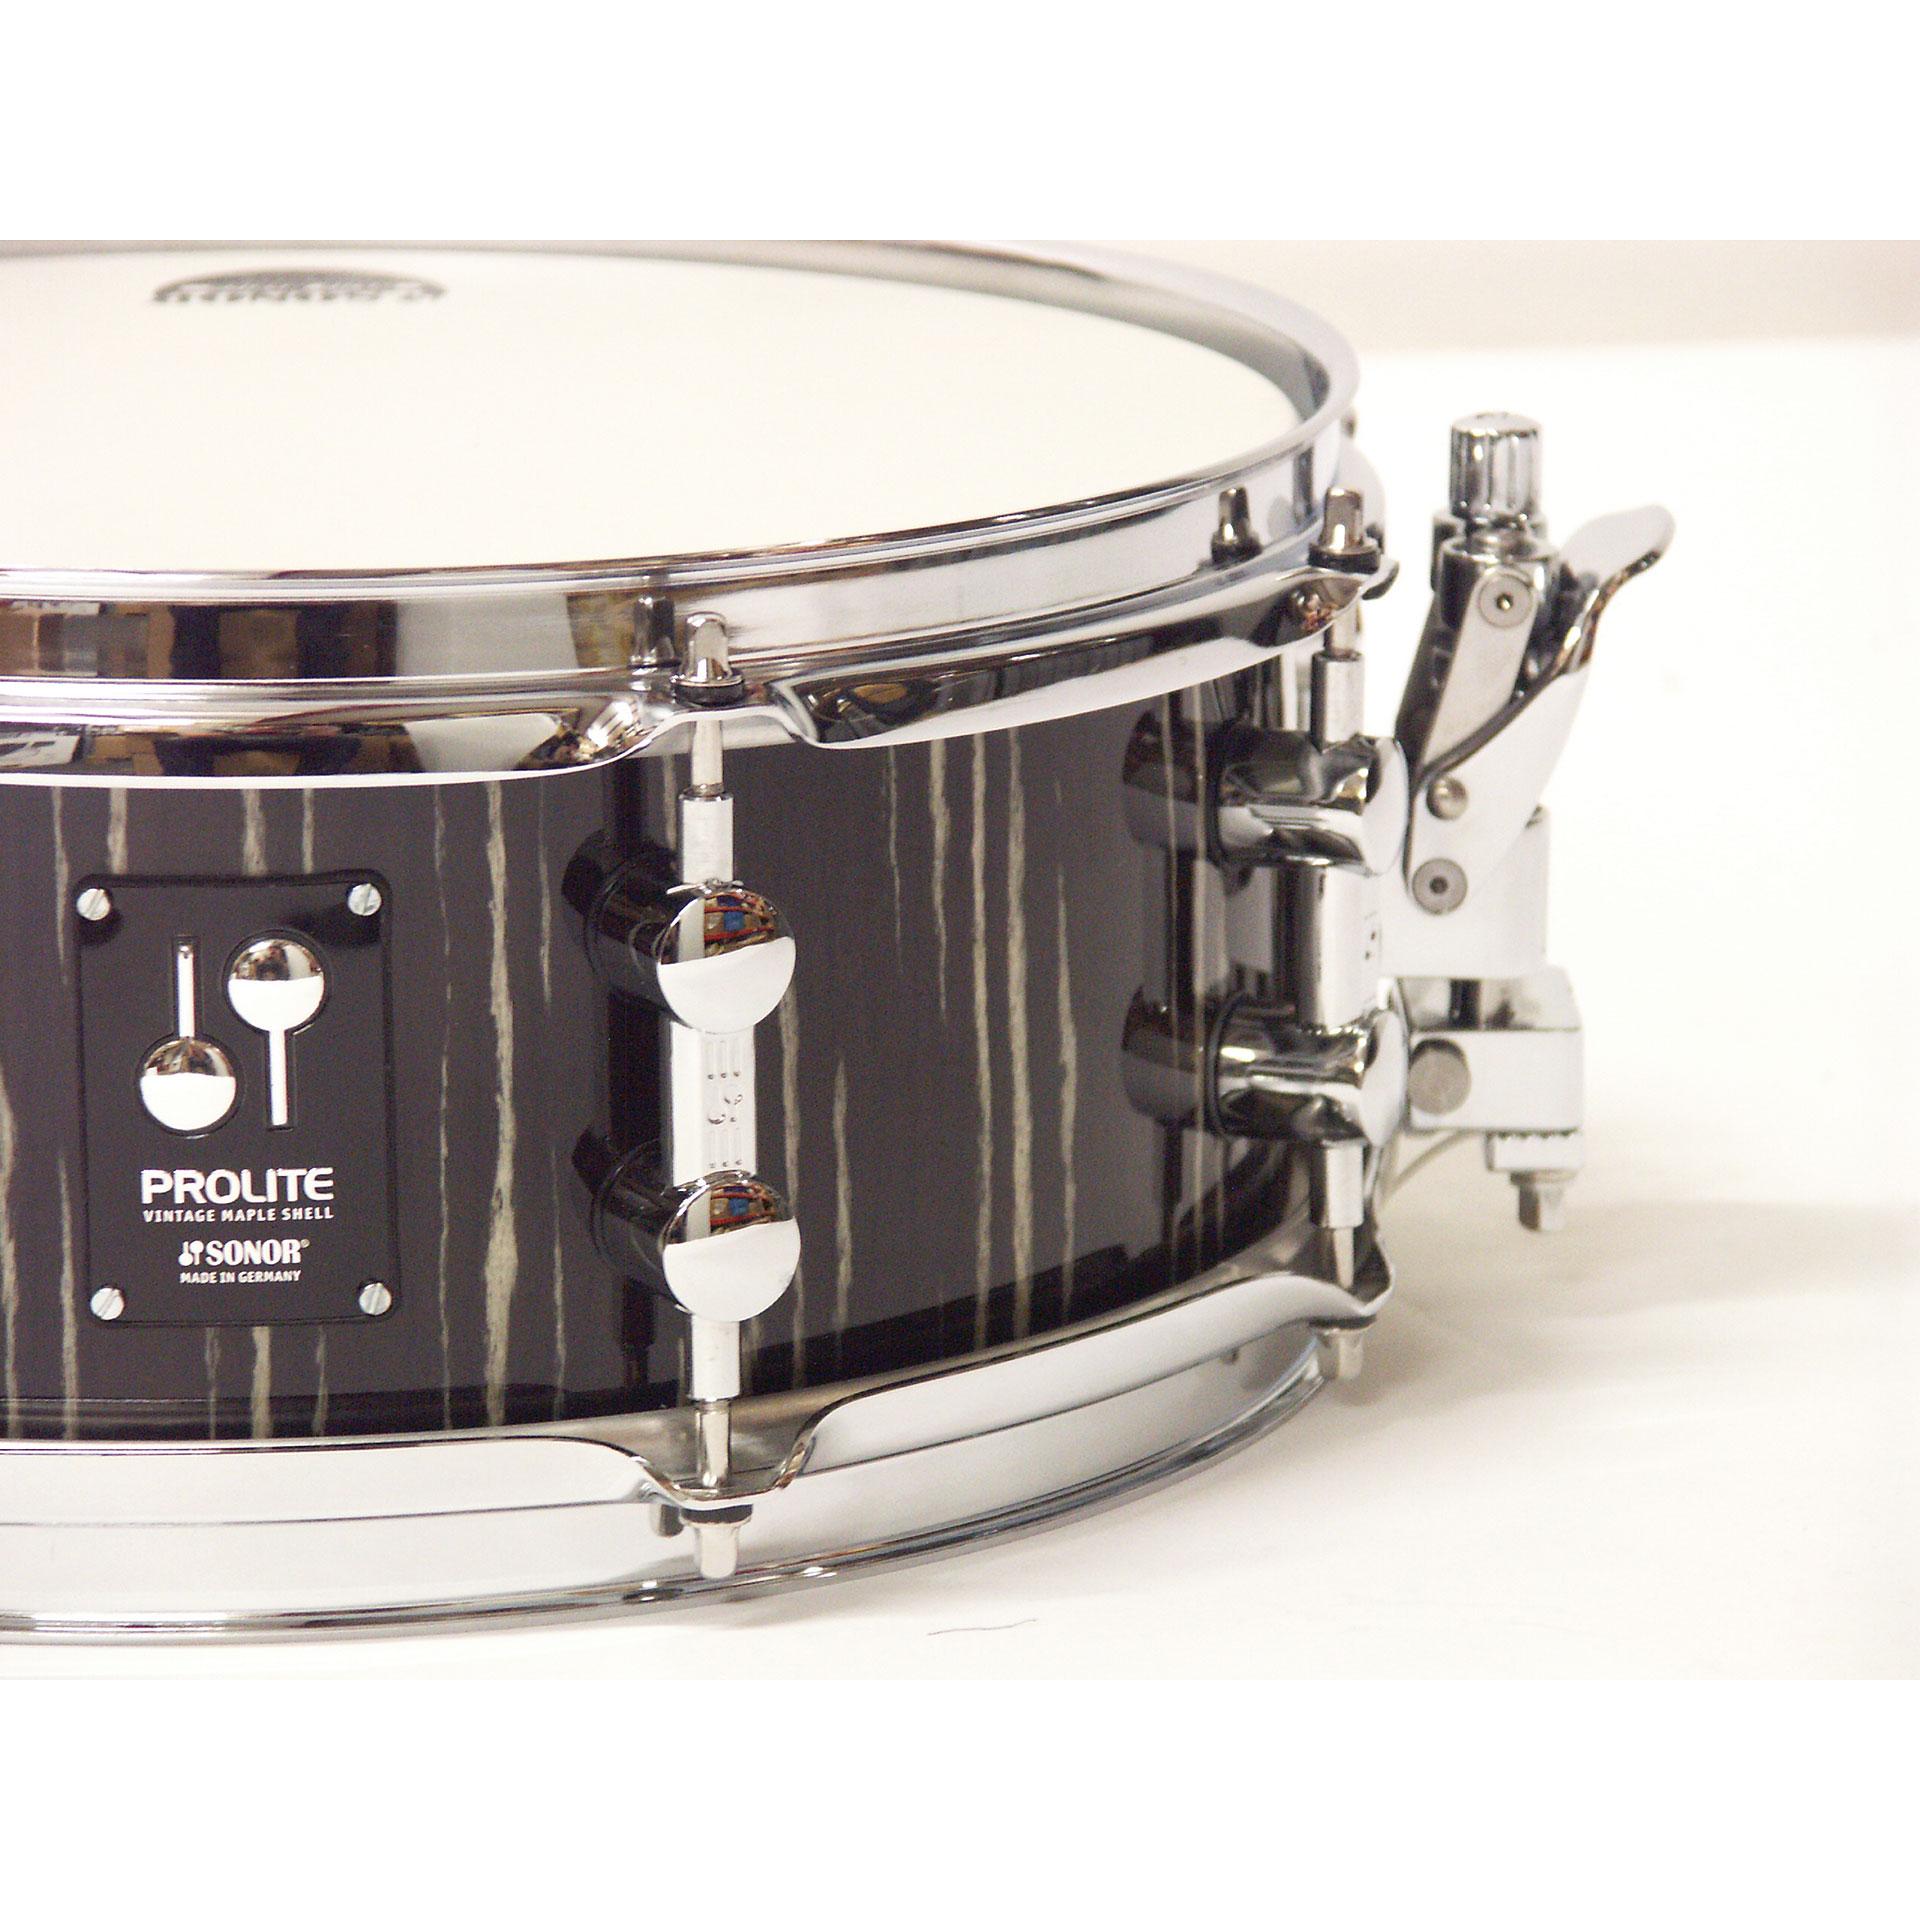 Sonor Prolite Pl 1205 Sdw Ebony White Stripes 171 Snare Drum